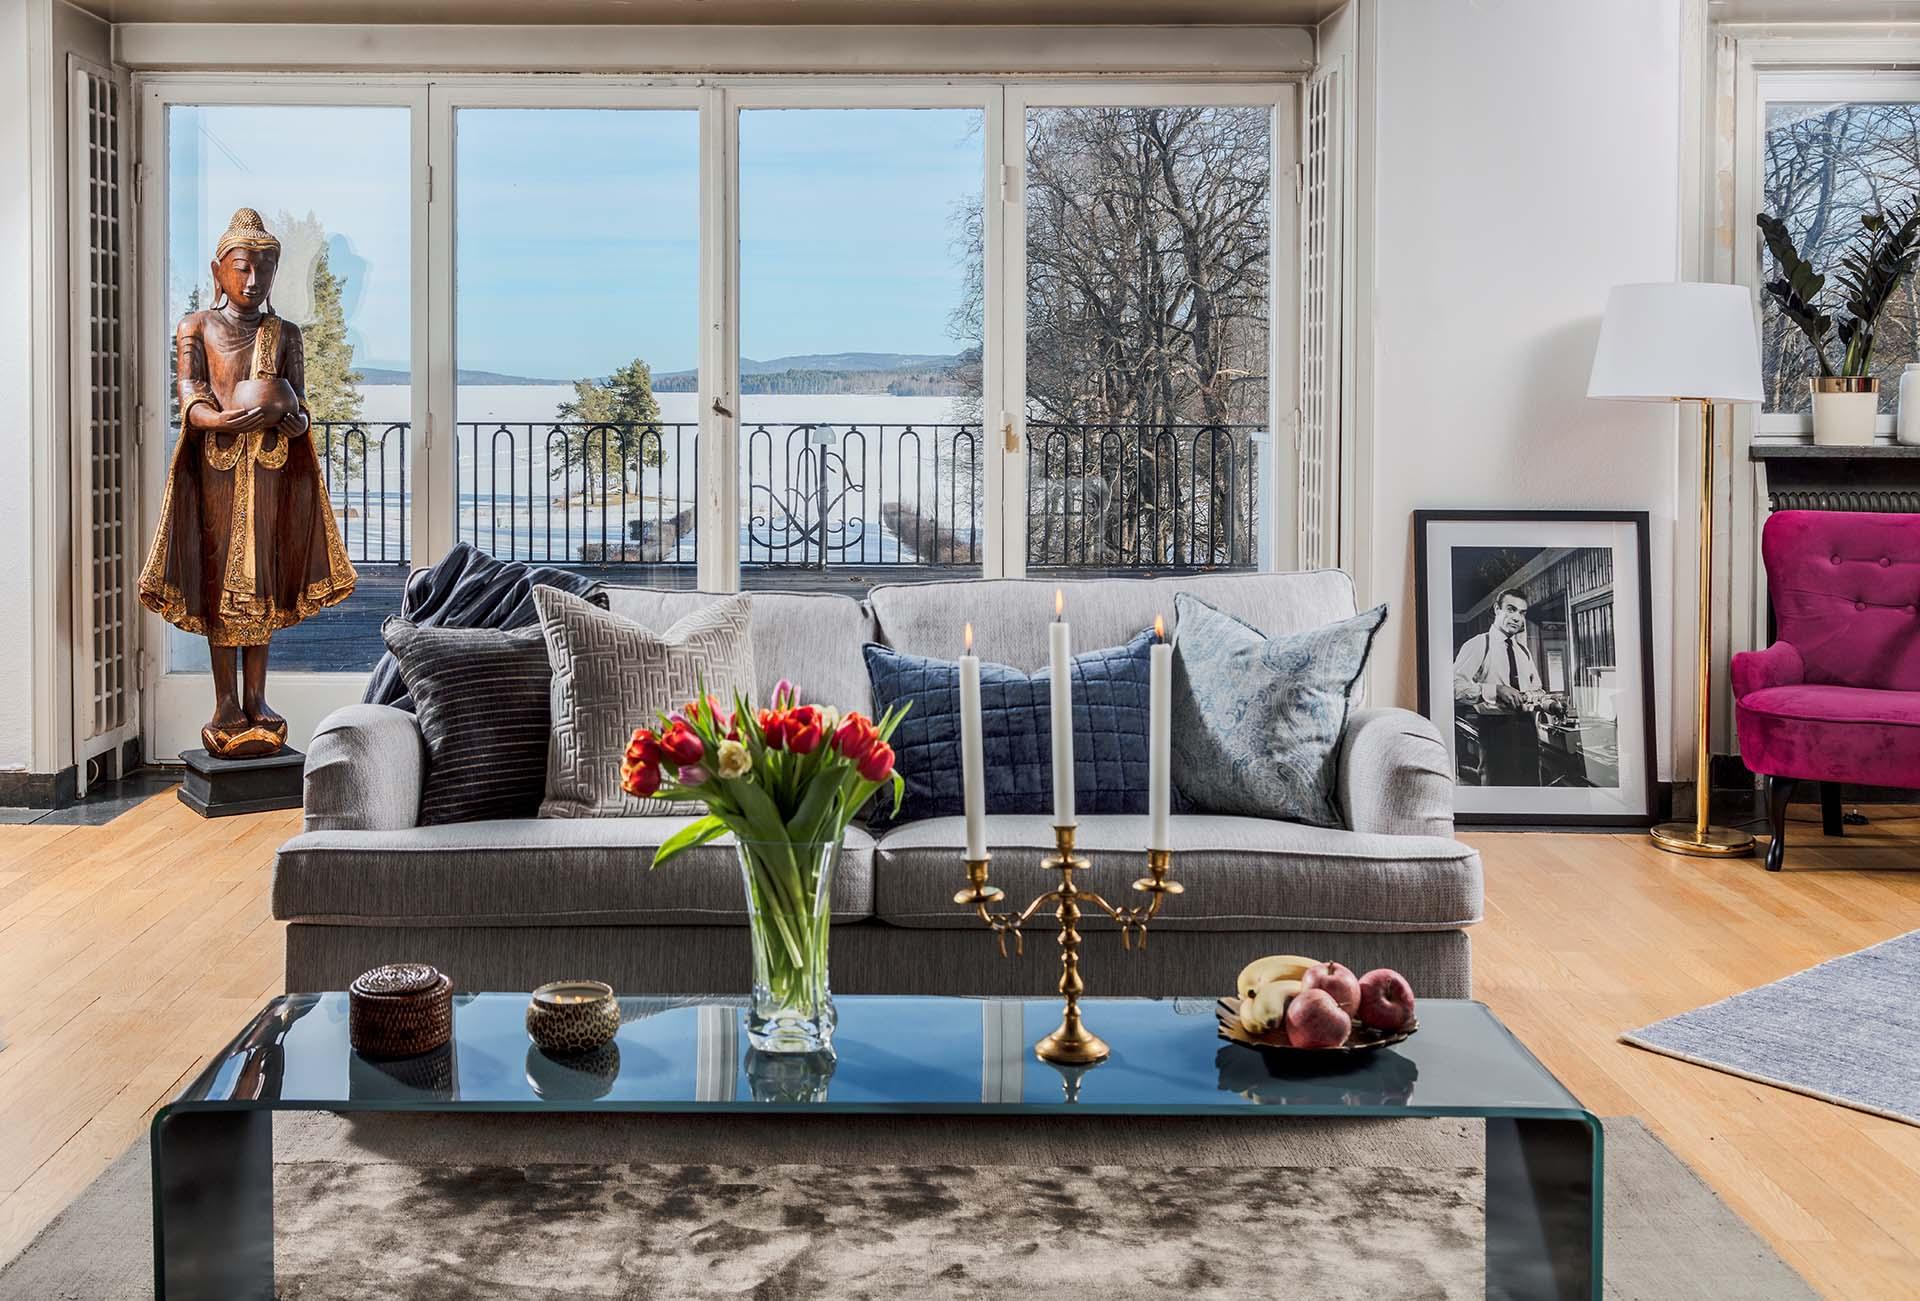 Lounge-saloneb Kilafors Herrgård